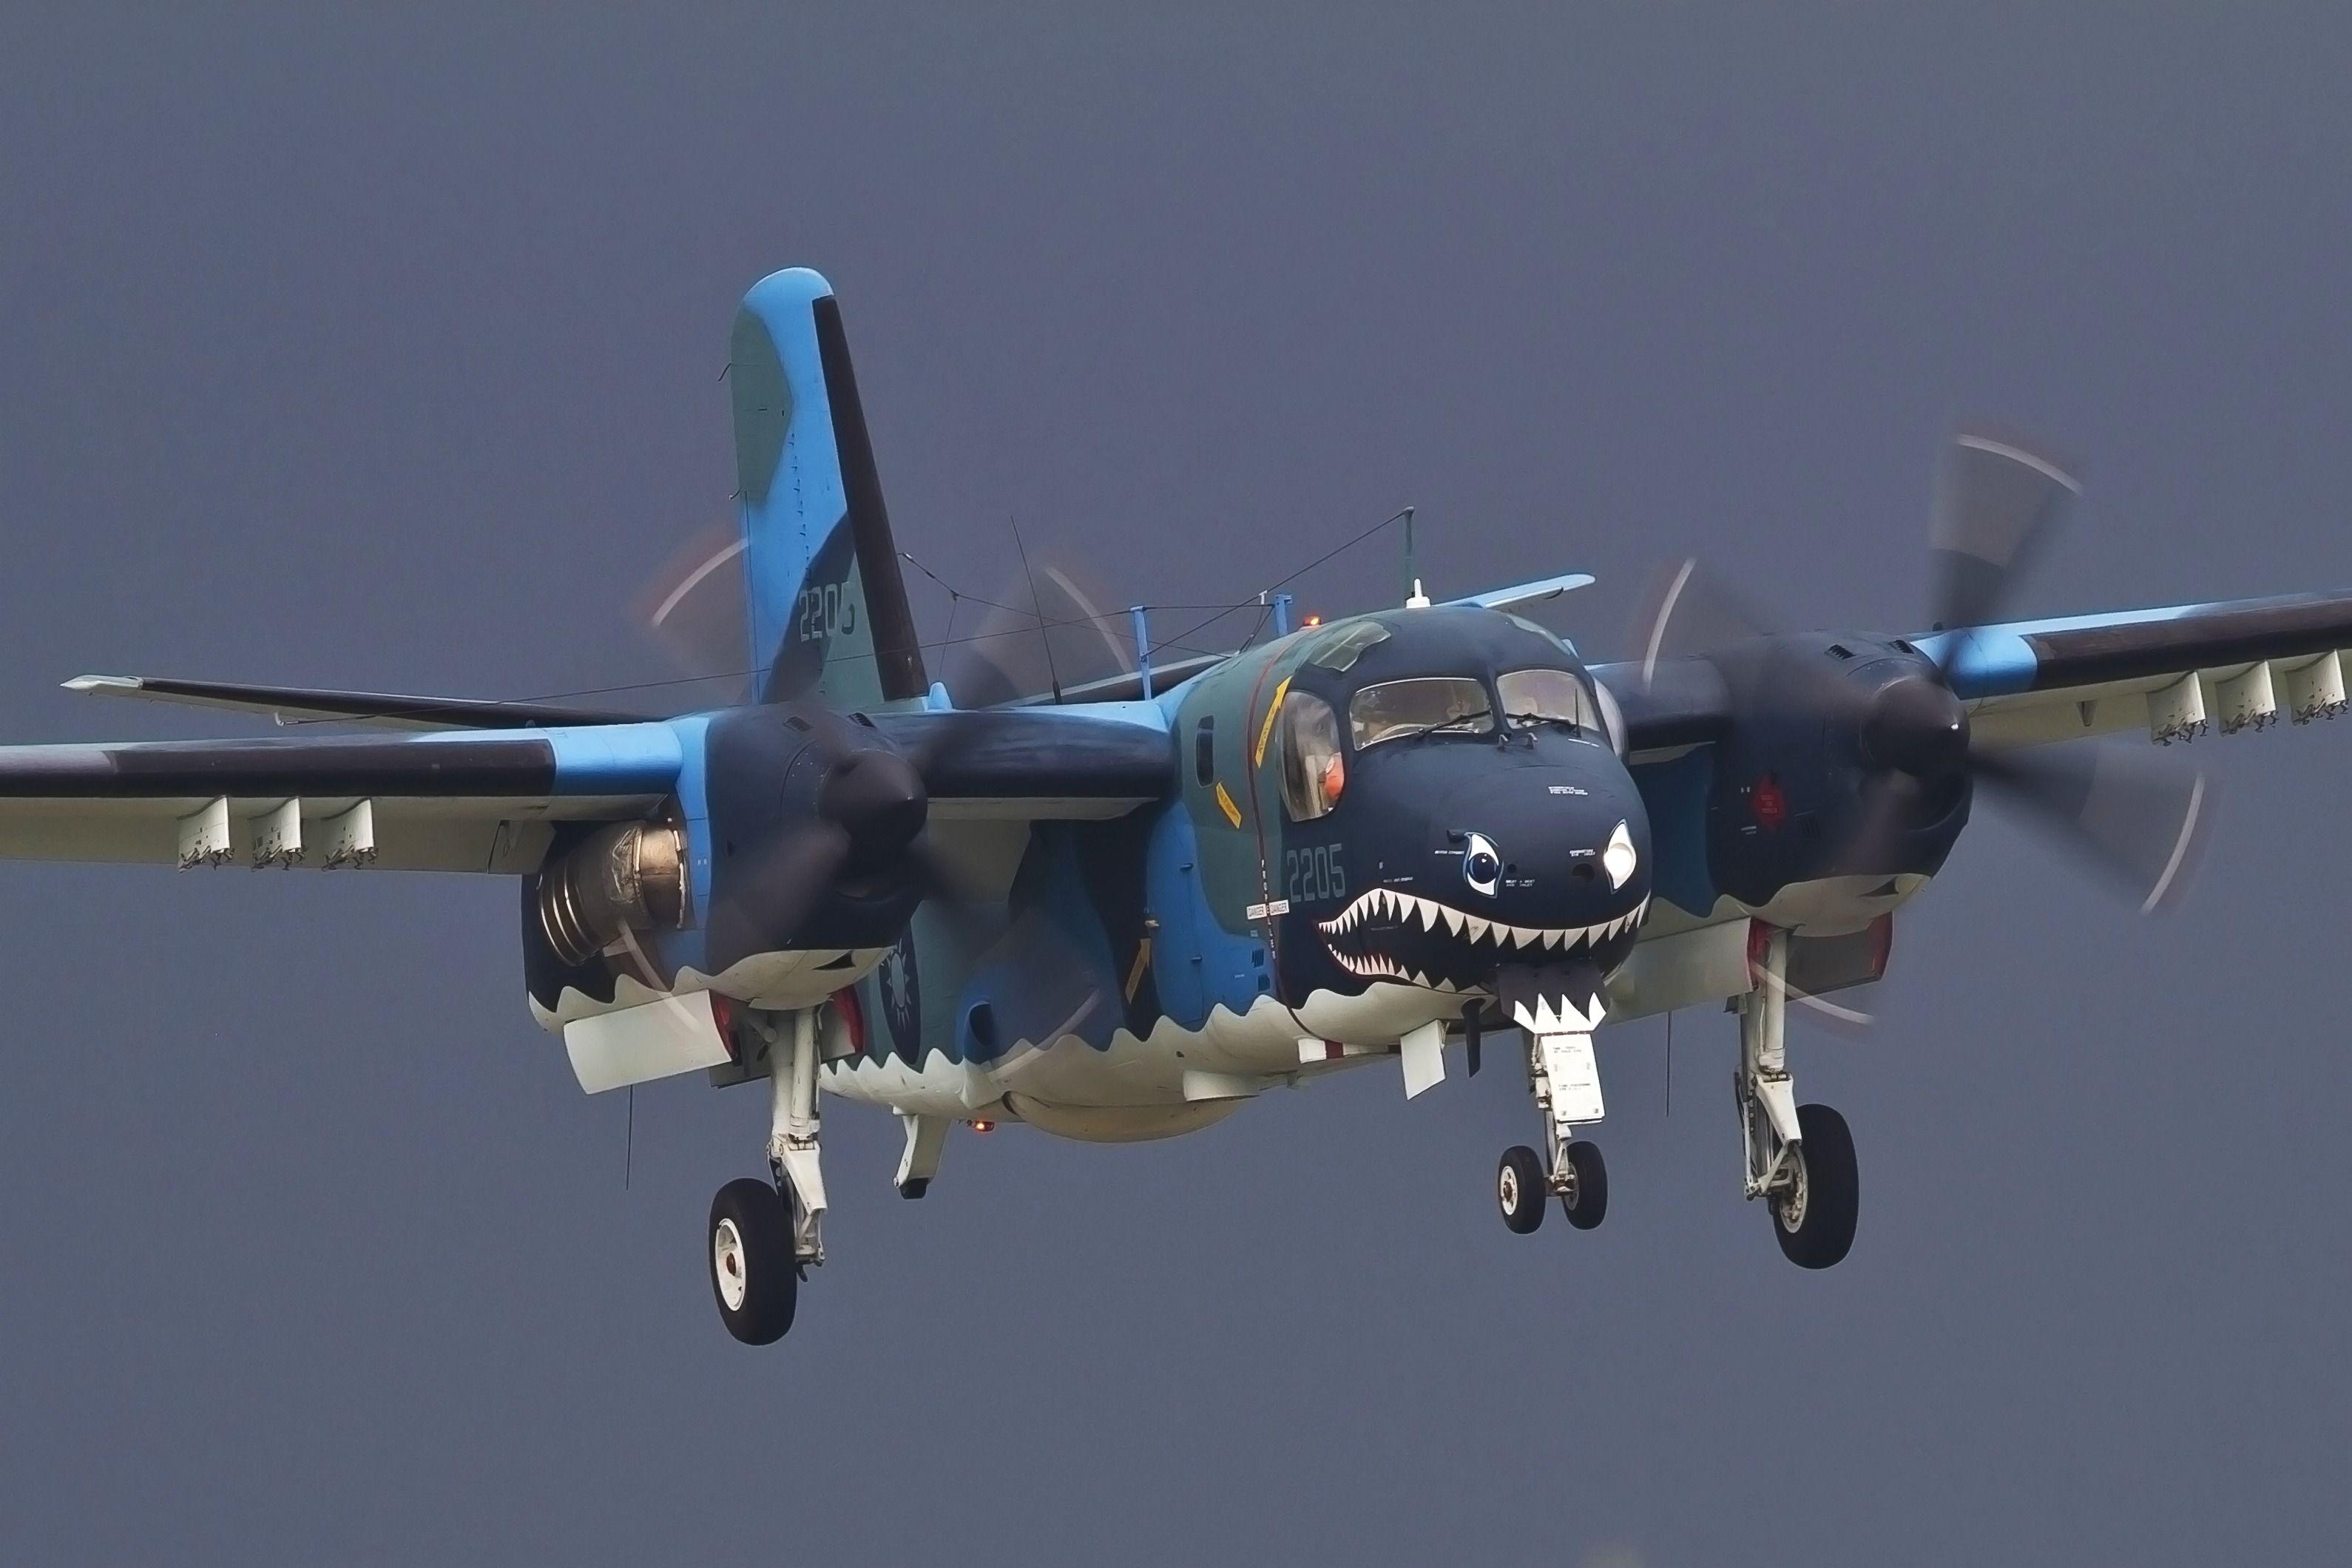 Grumman S 2 Tracker Aviation Fighter Jets Military Aircraft